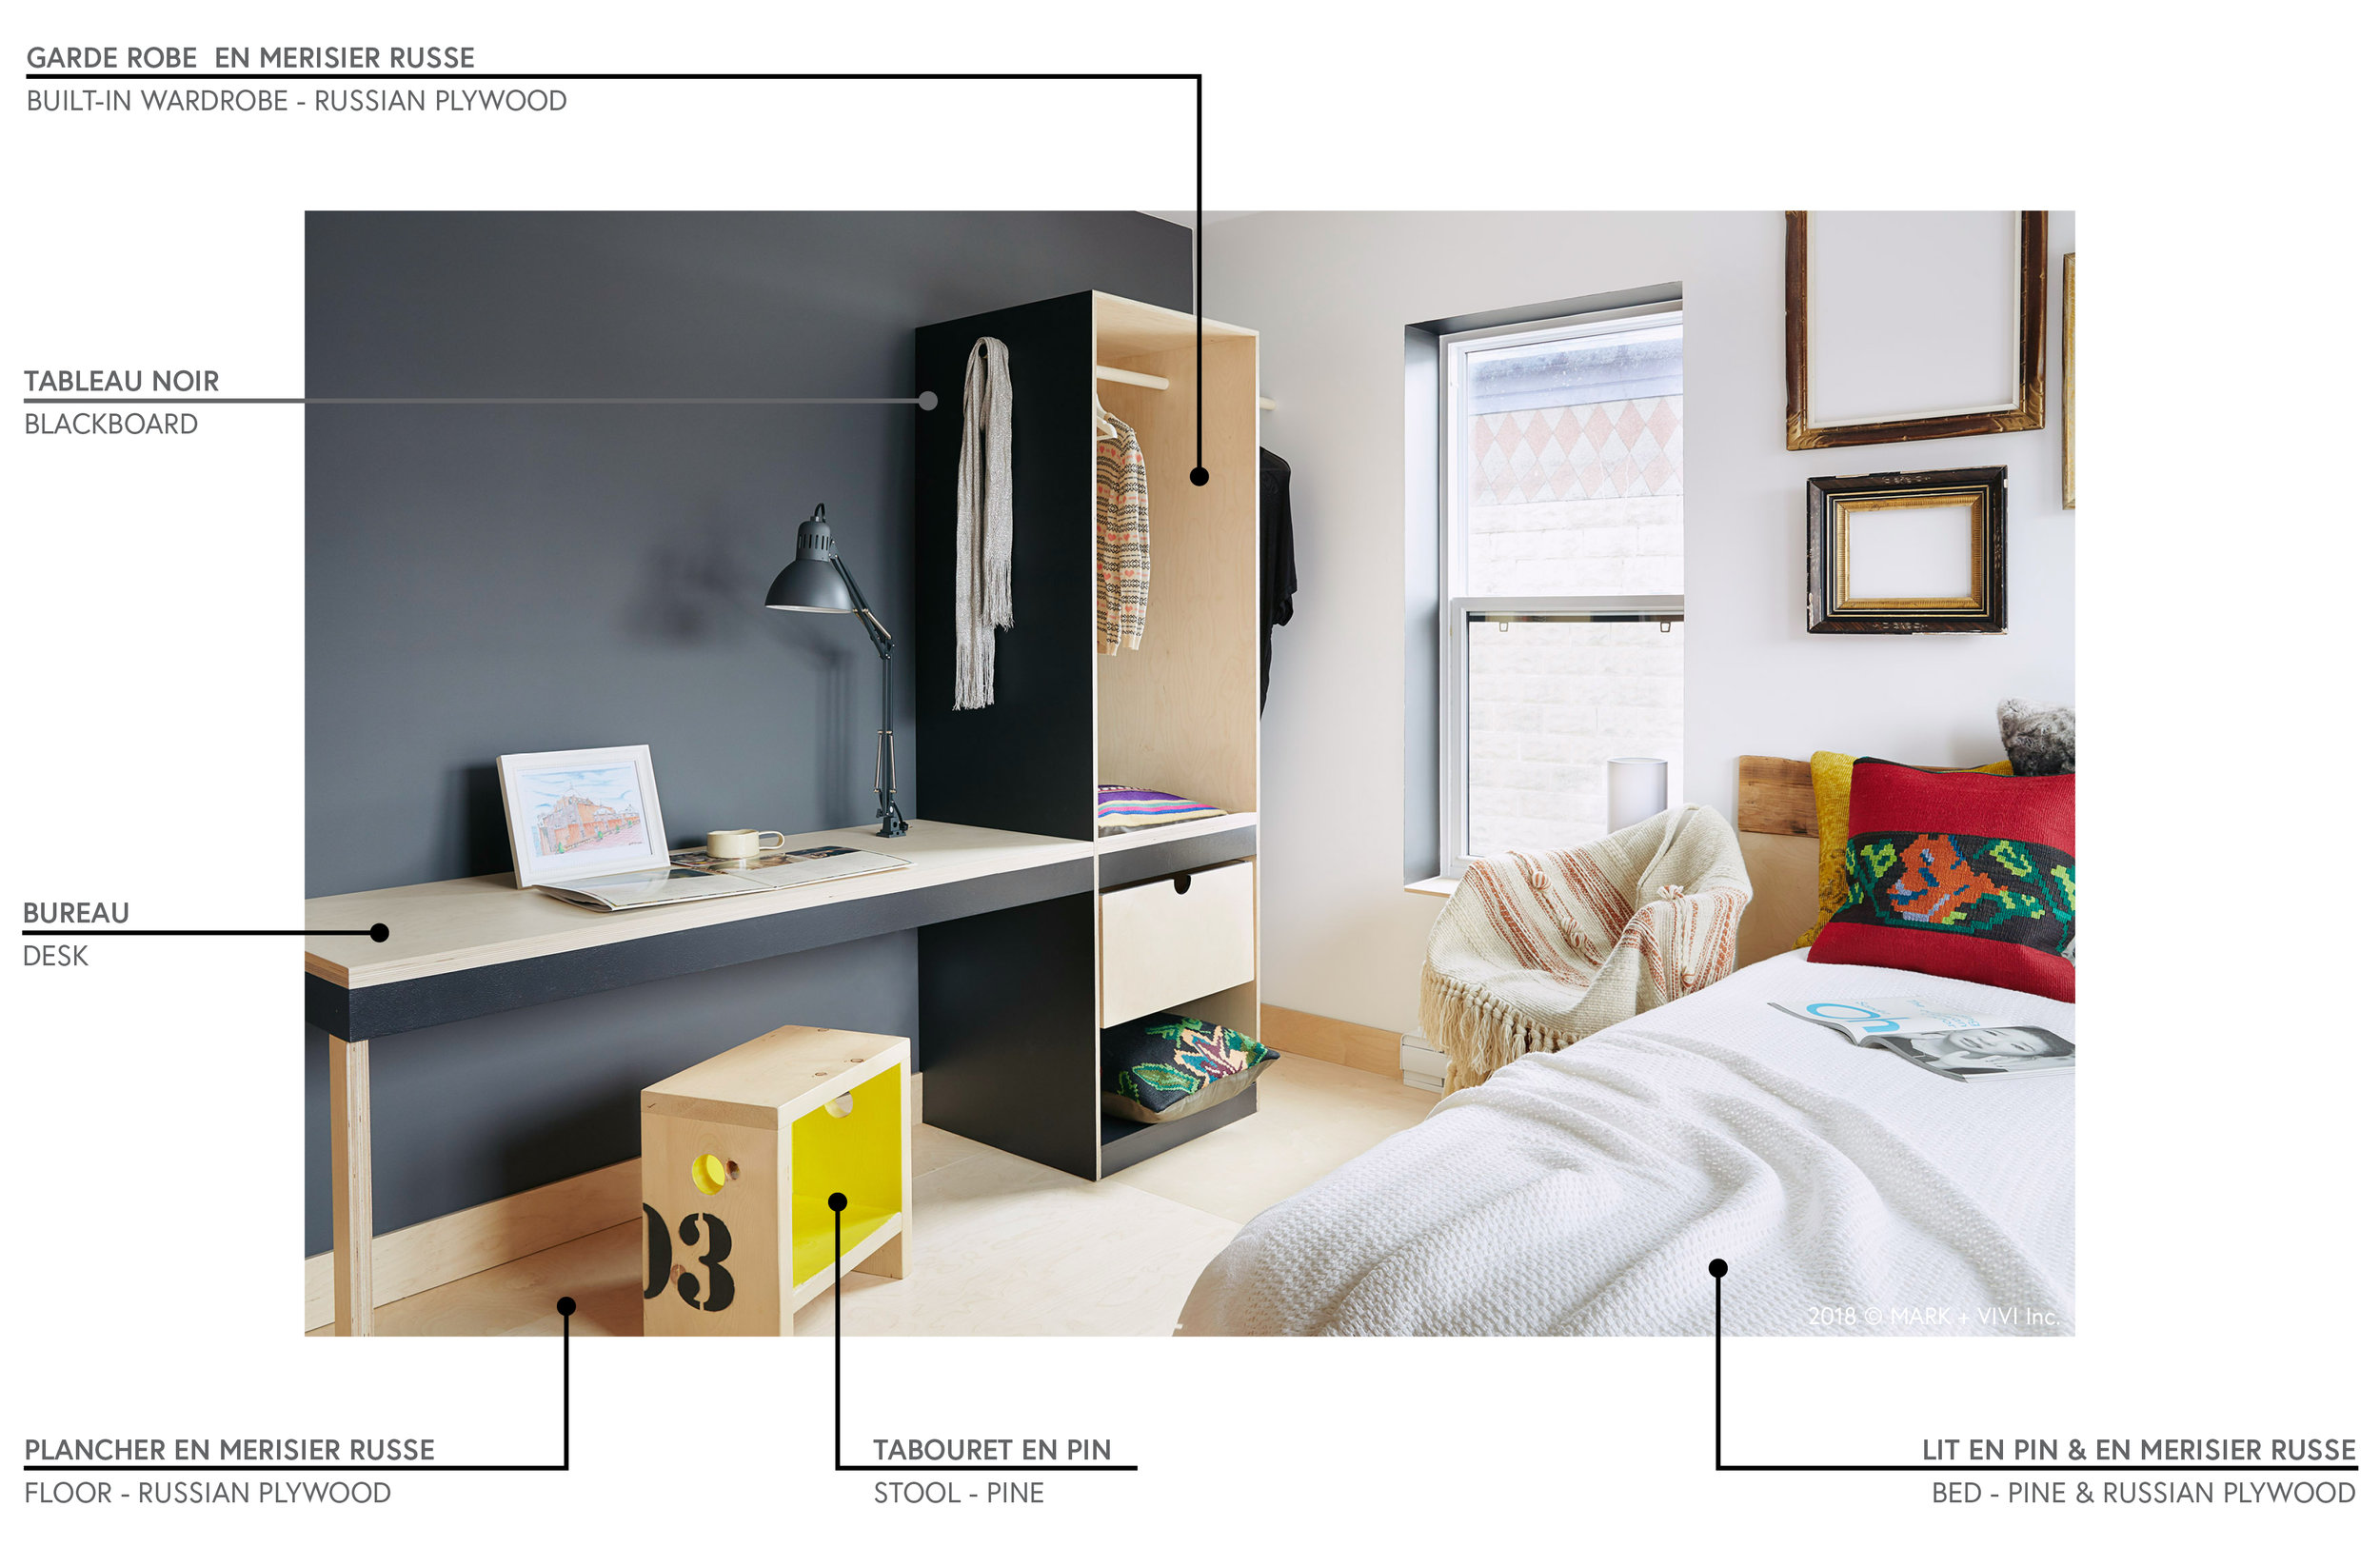 Modèle de chambre meublée  | Model of furnished bedroom